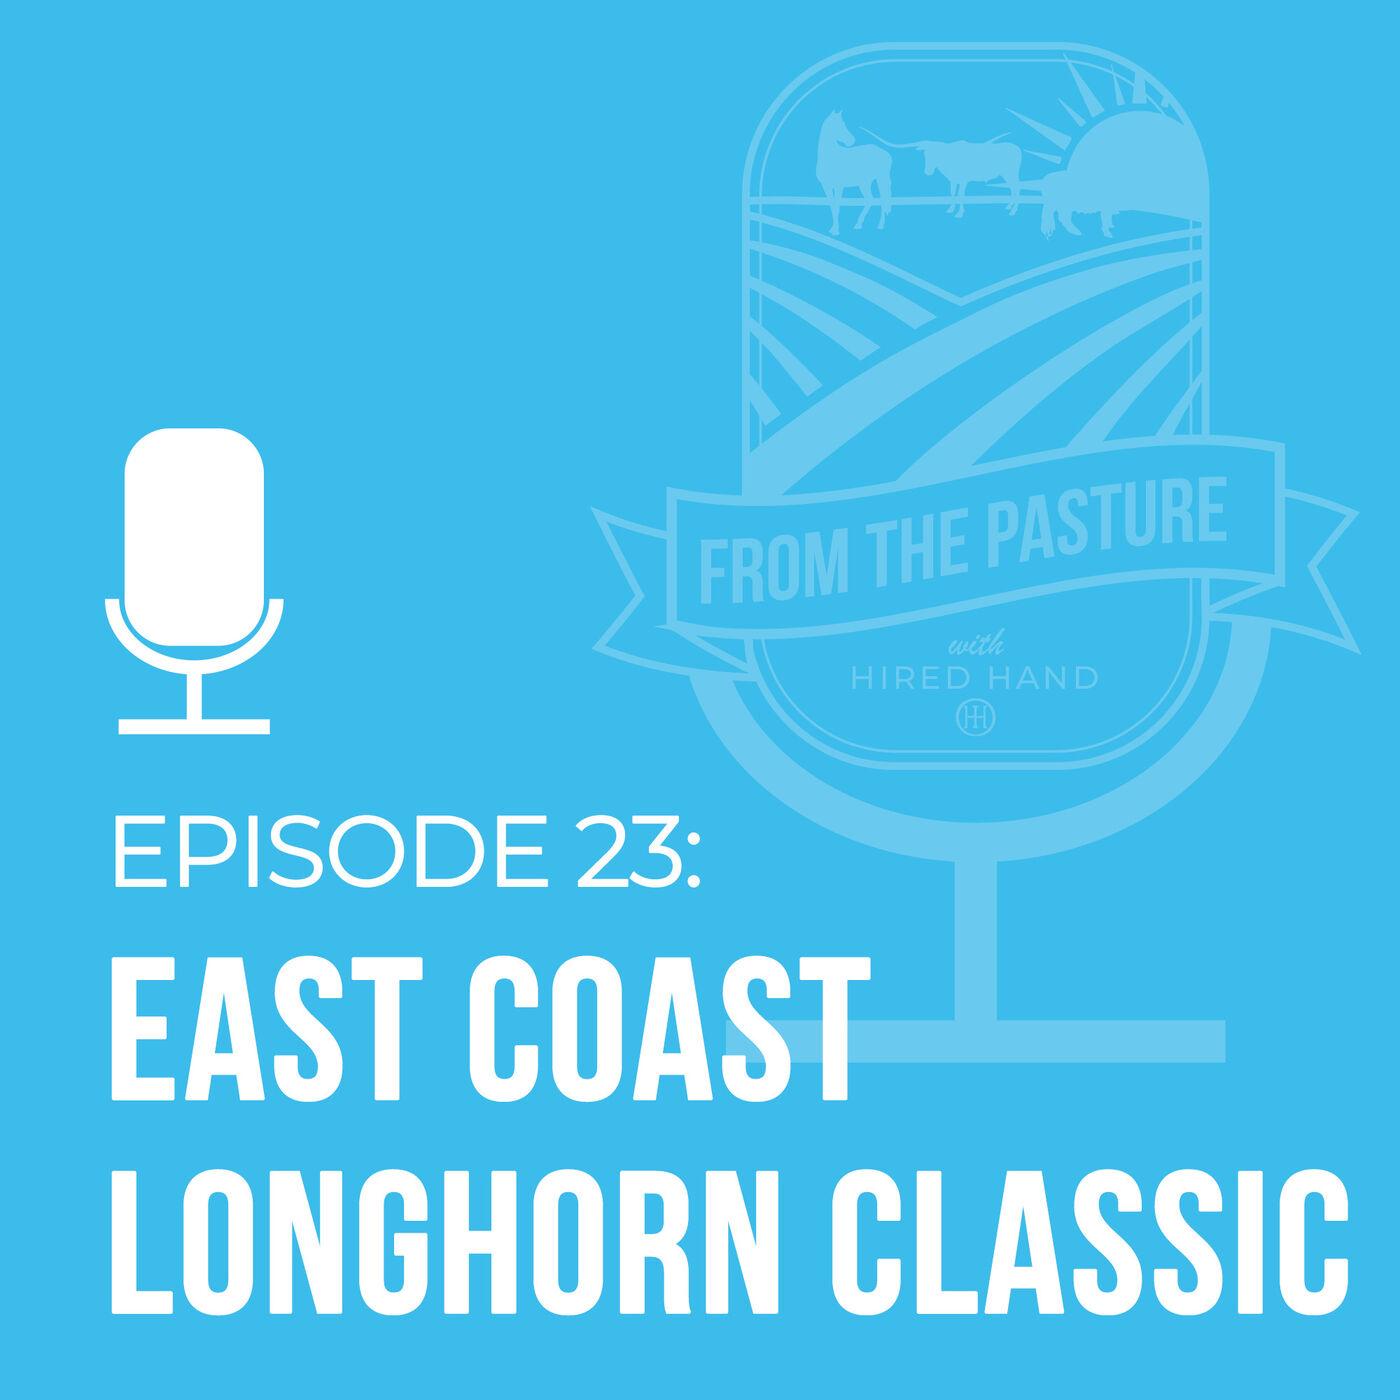 East Coast Longhorn Classic